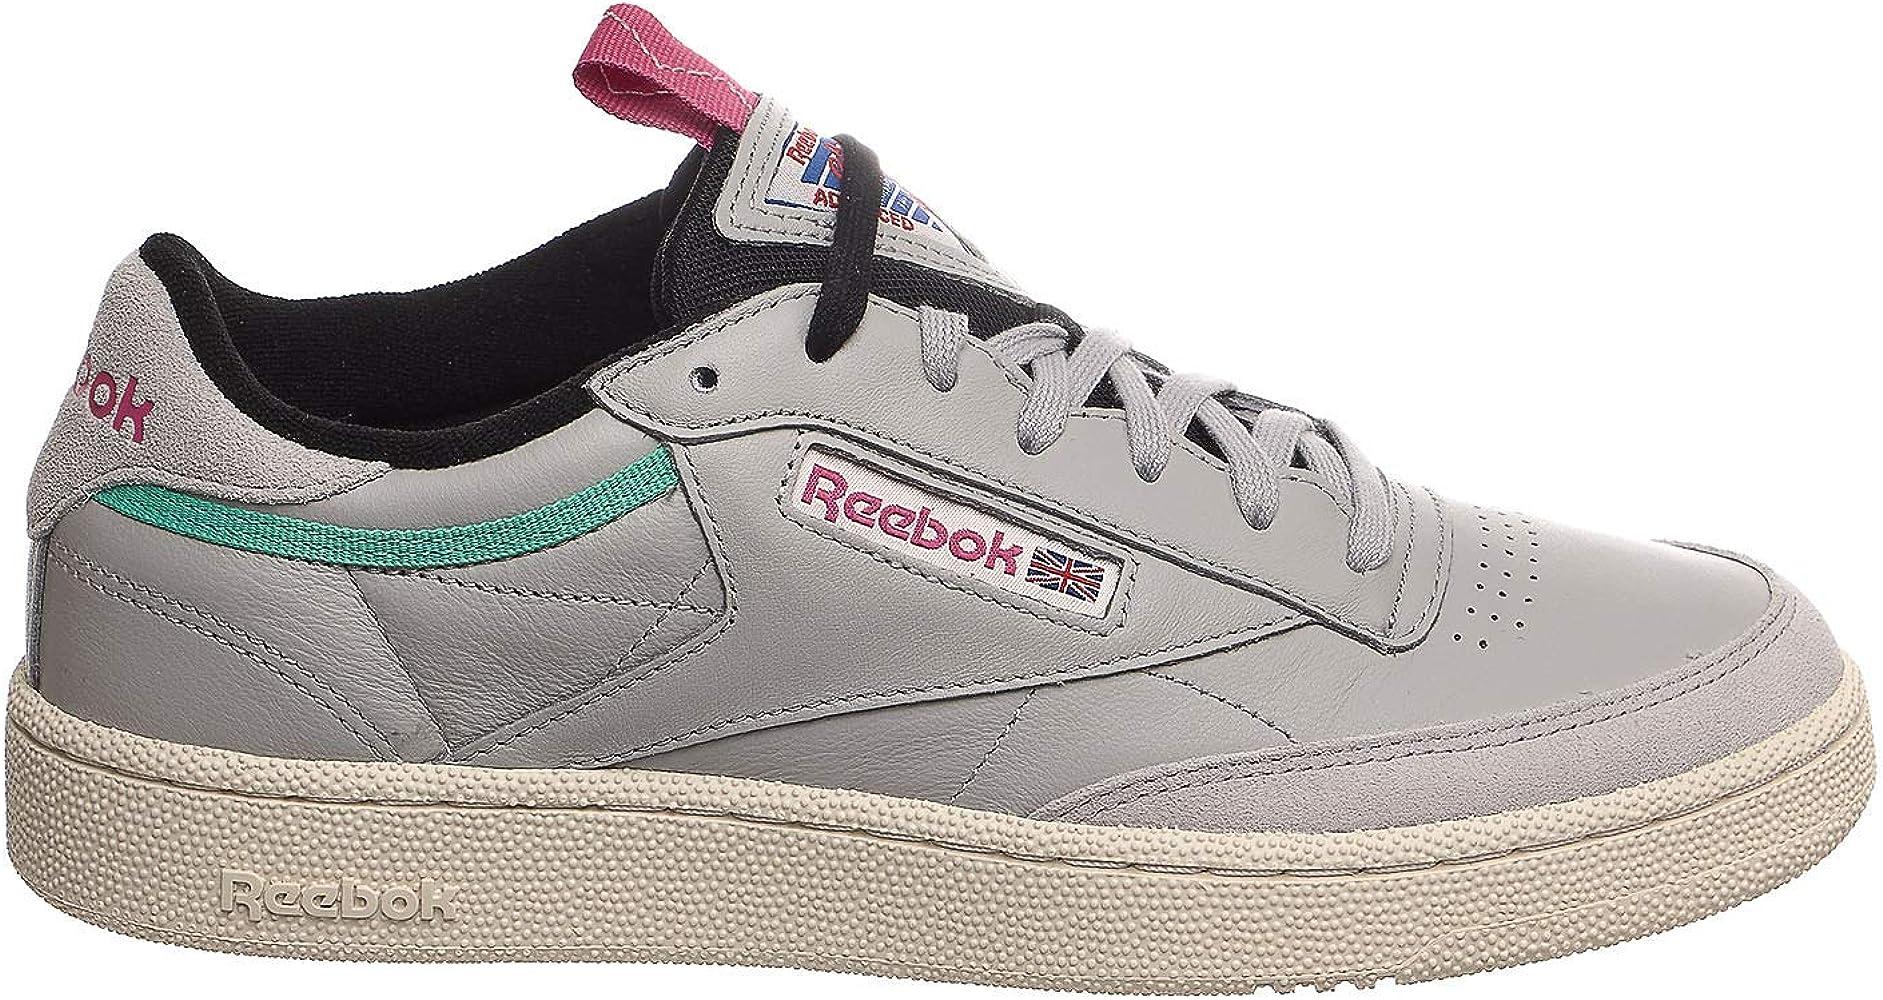 Reebok Club C 85 Rad Grey Size: 10 UK